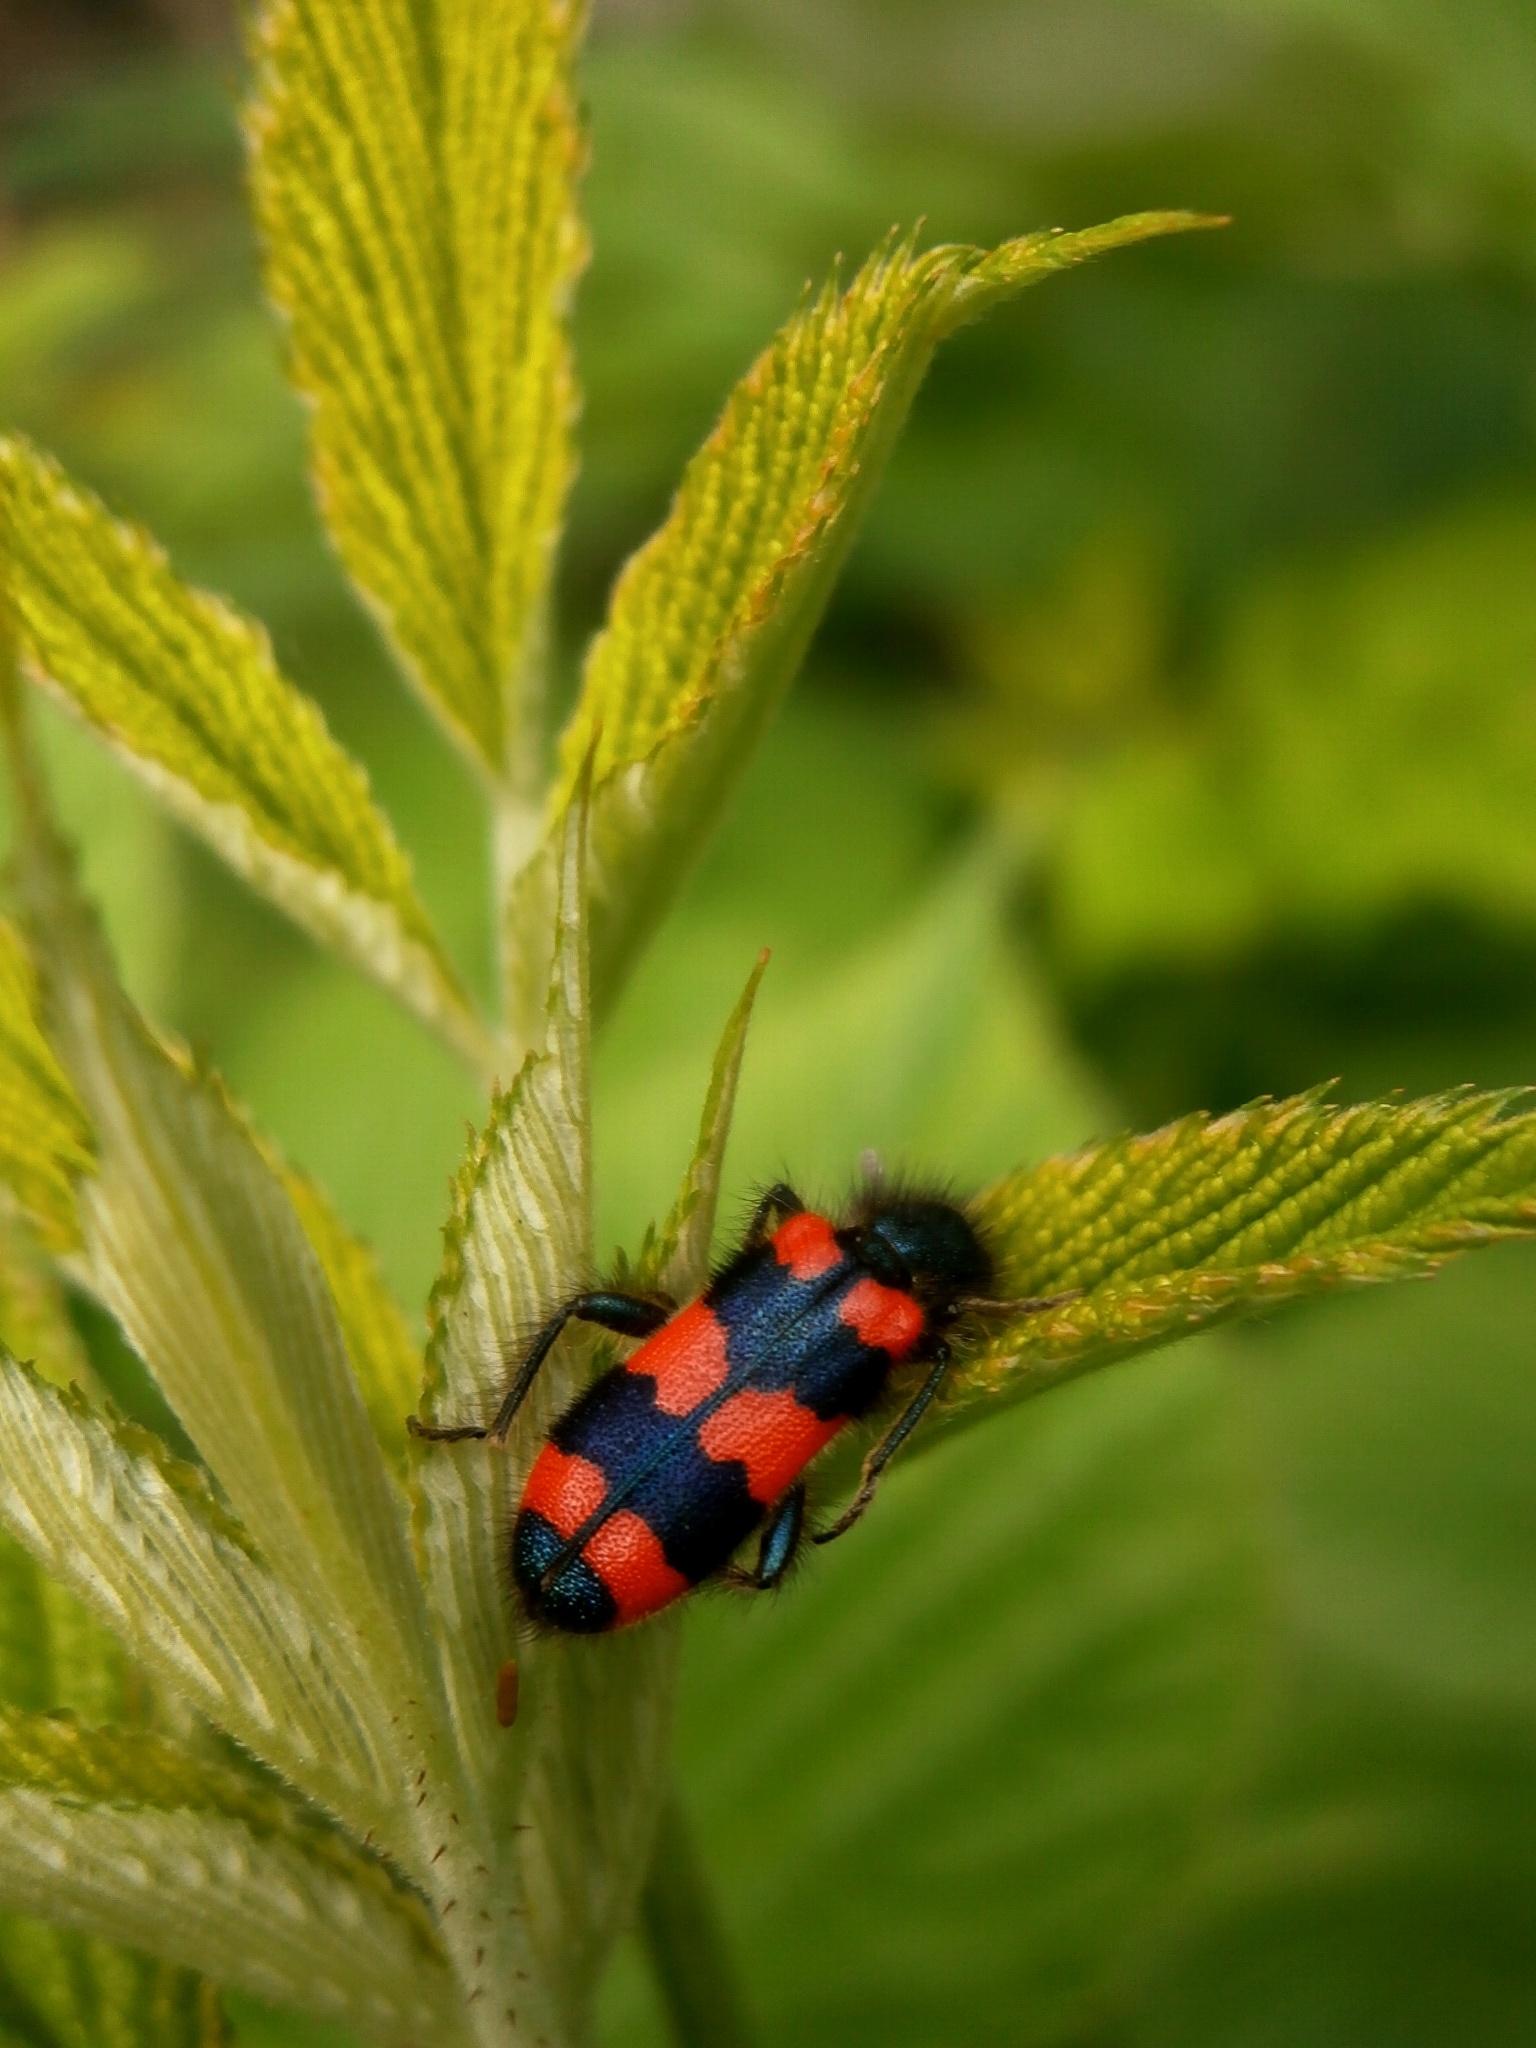 red-black beetle by Josip Šibarić